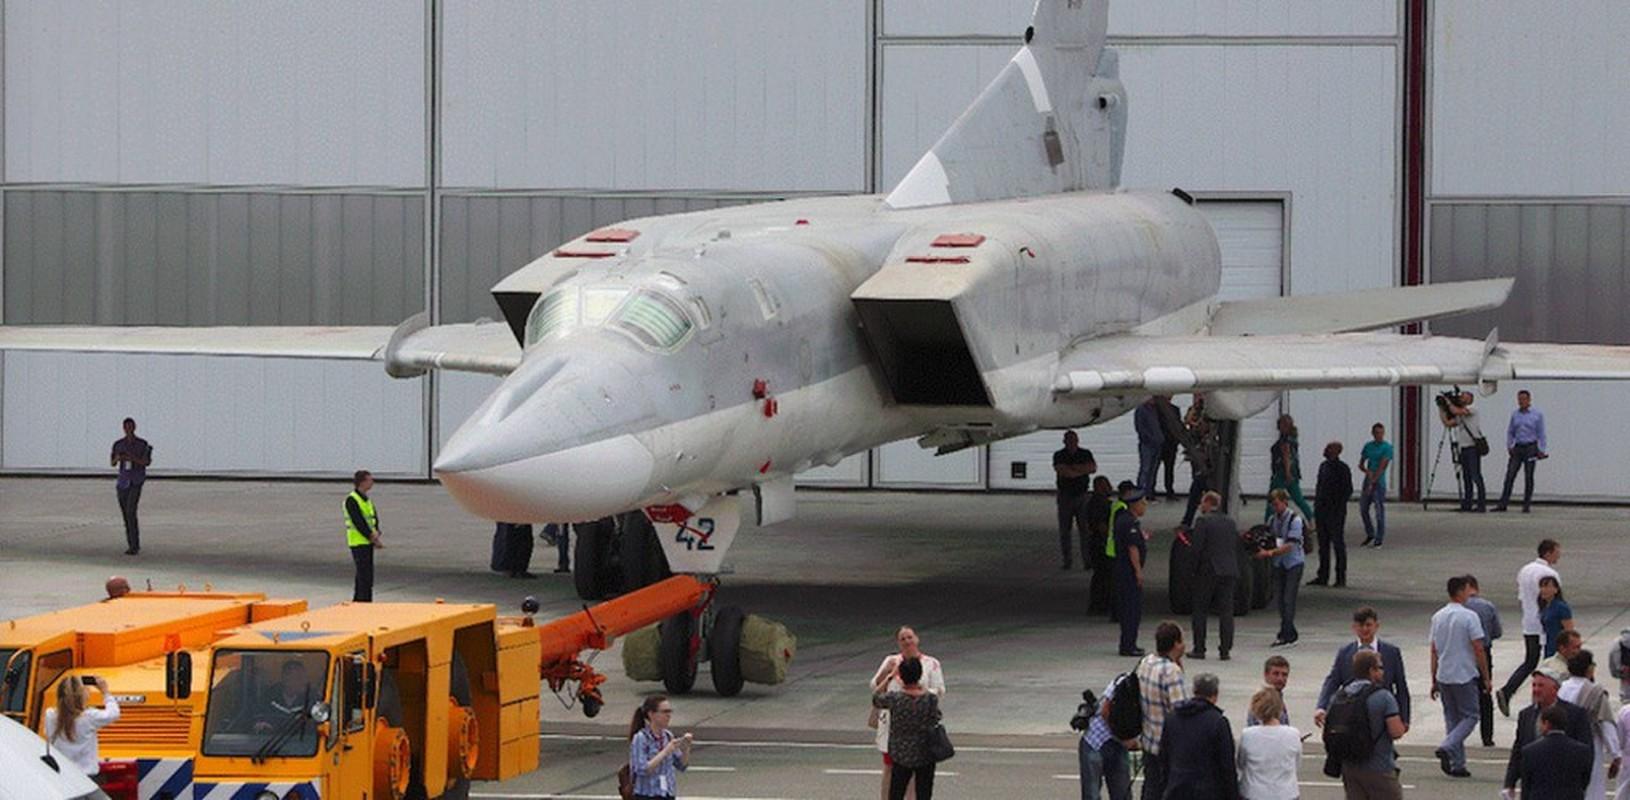 Khong phat trien may bay nem bom moi, Nga dat cuoc toan bo vao Tu-22M3M-Hinh-11